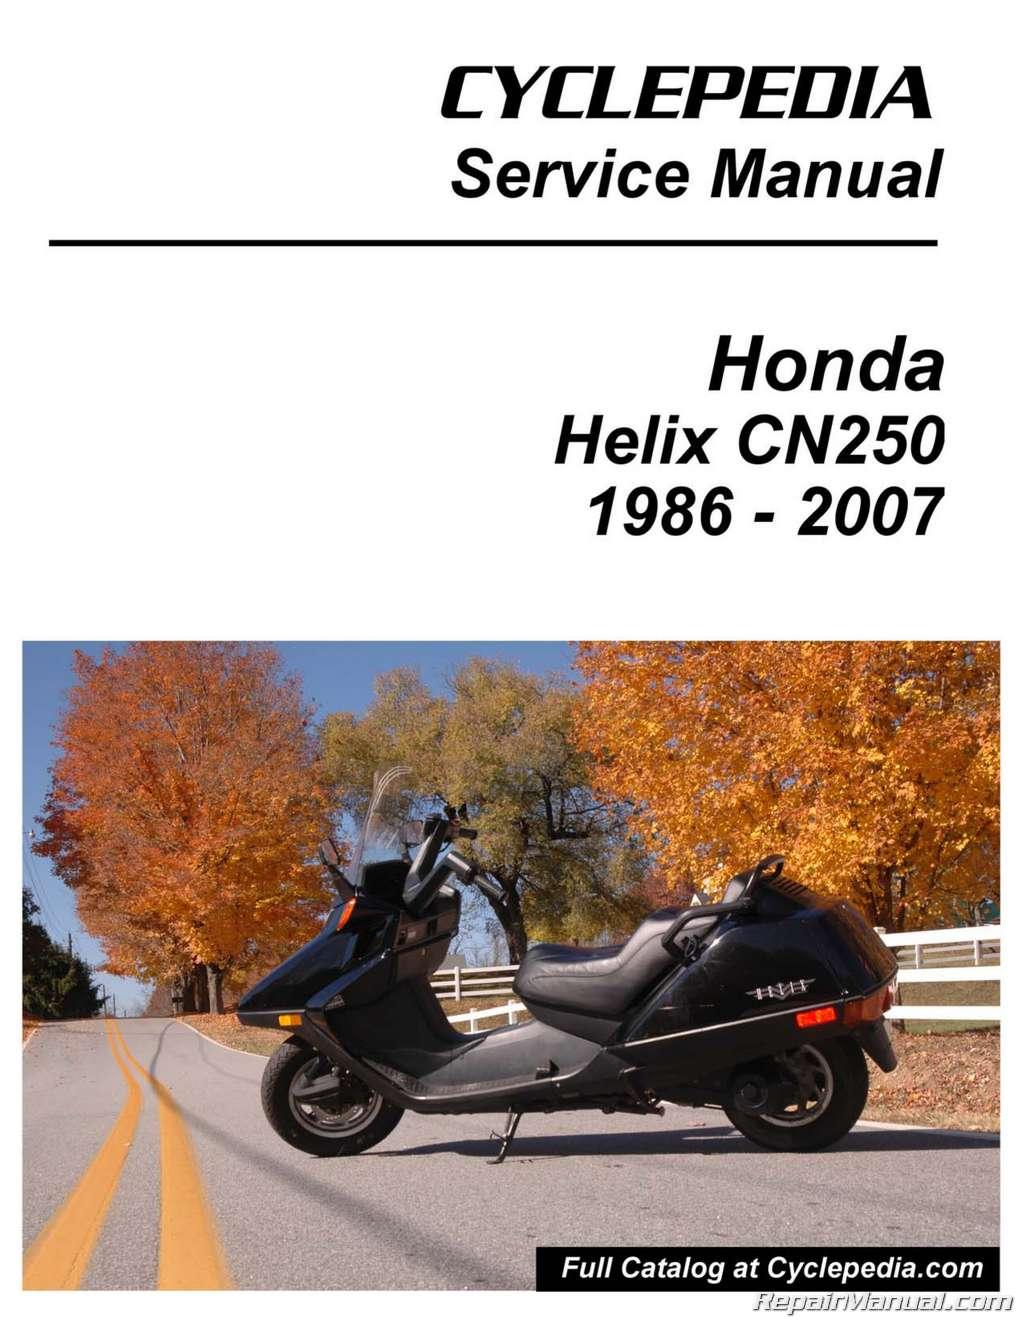 hight resolution of cyclepedia honda helix manual